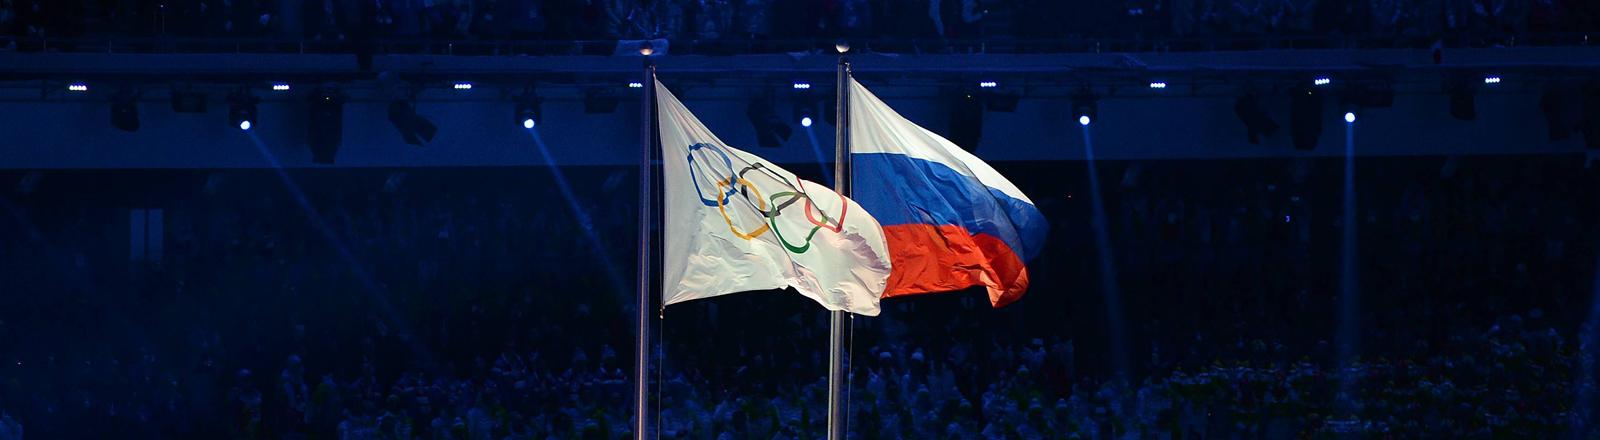 Russische Flagge neben der Olympia-Flagge